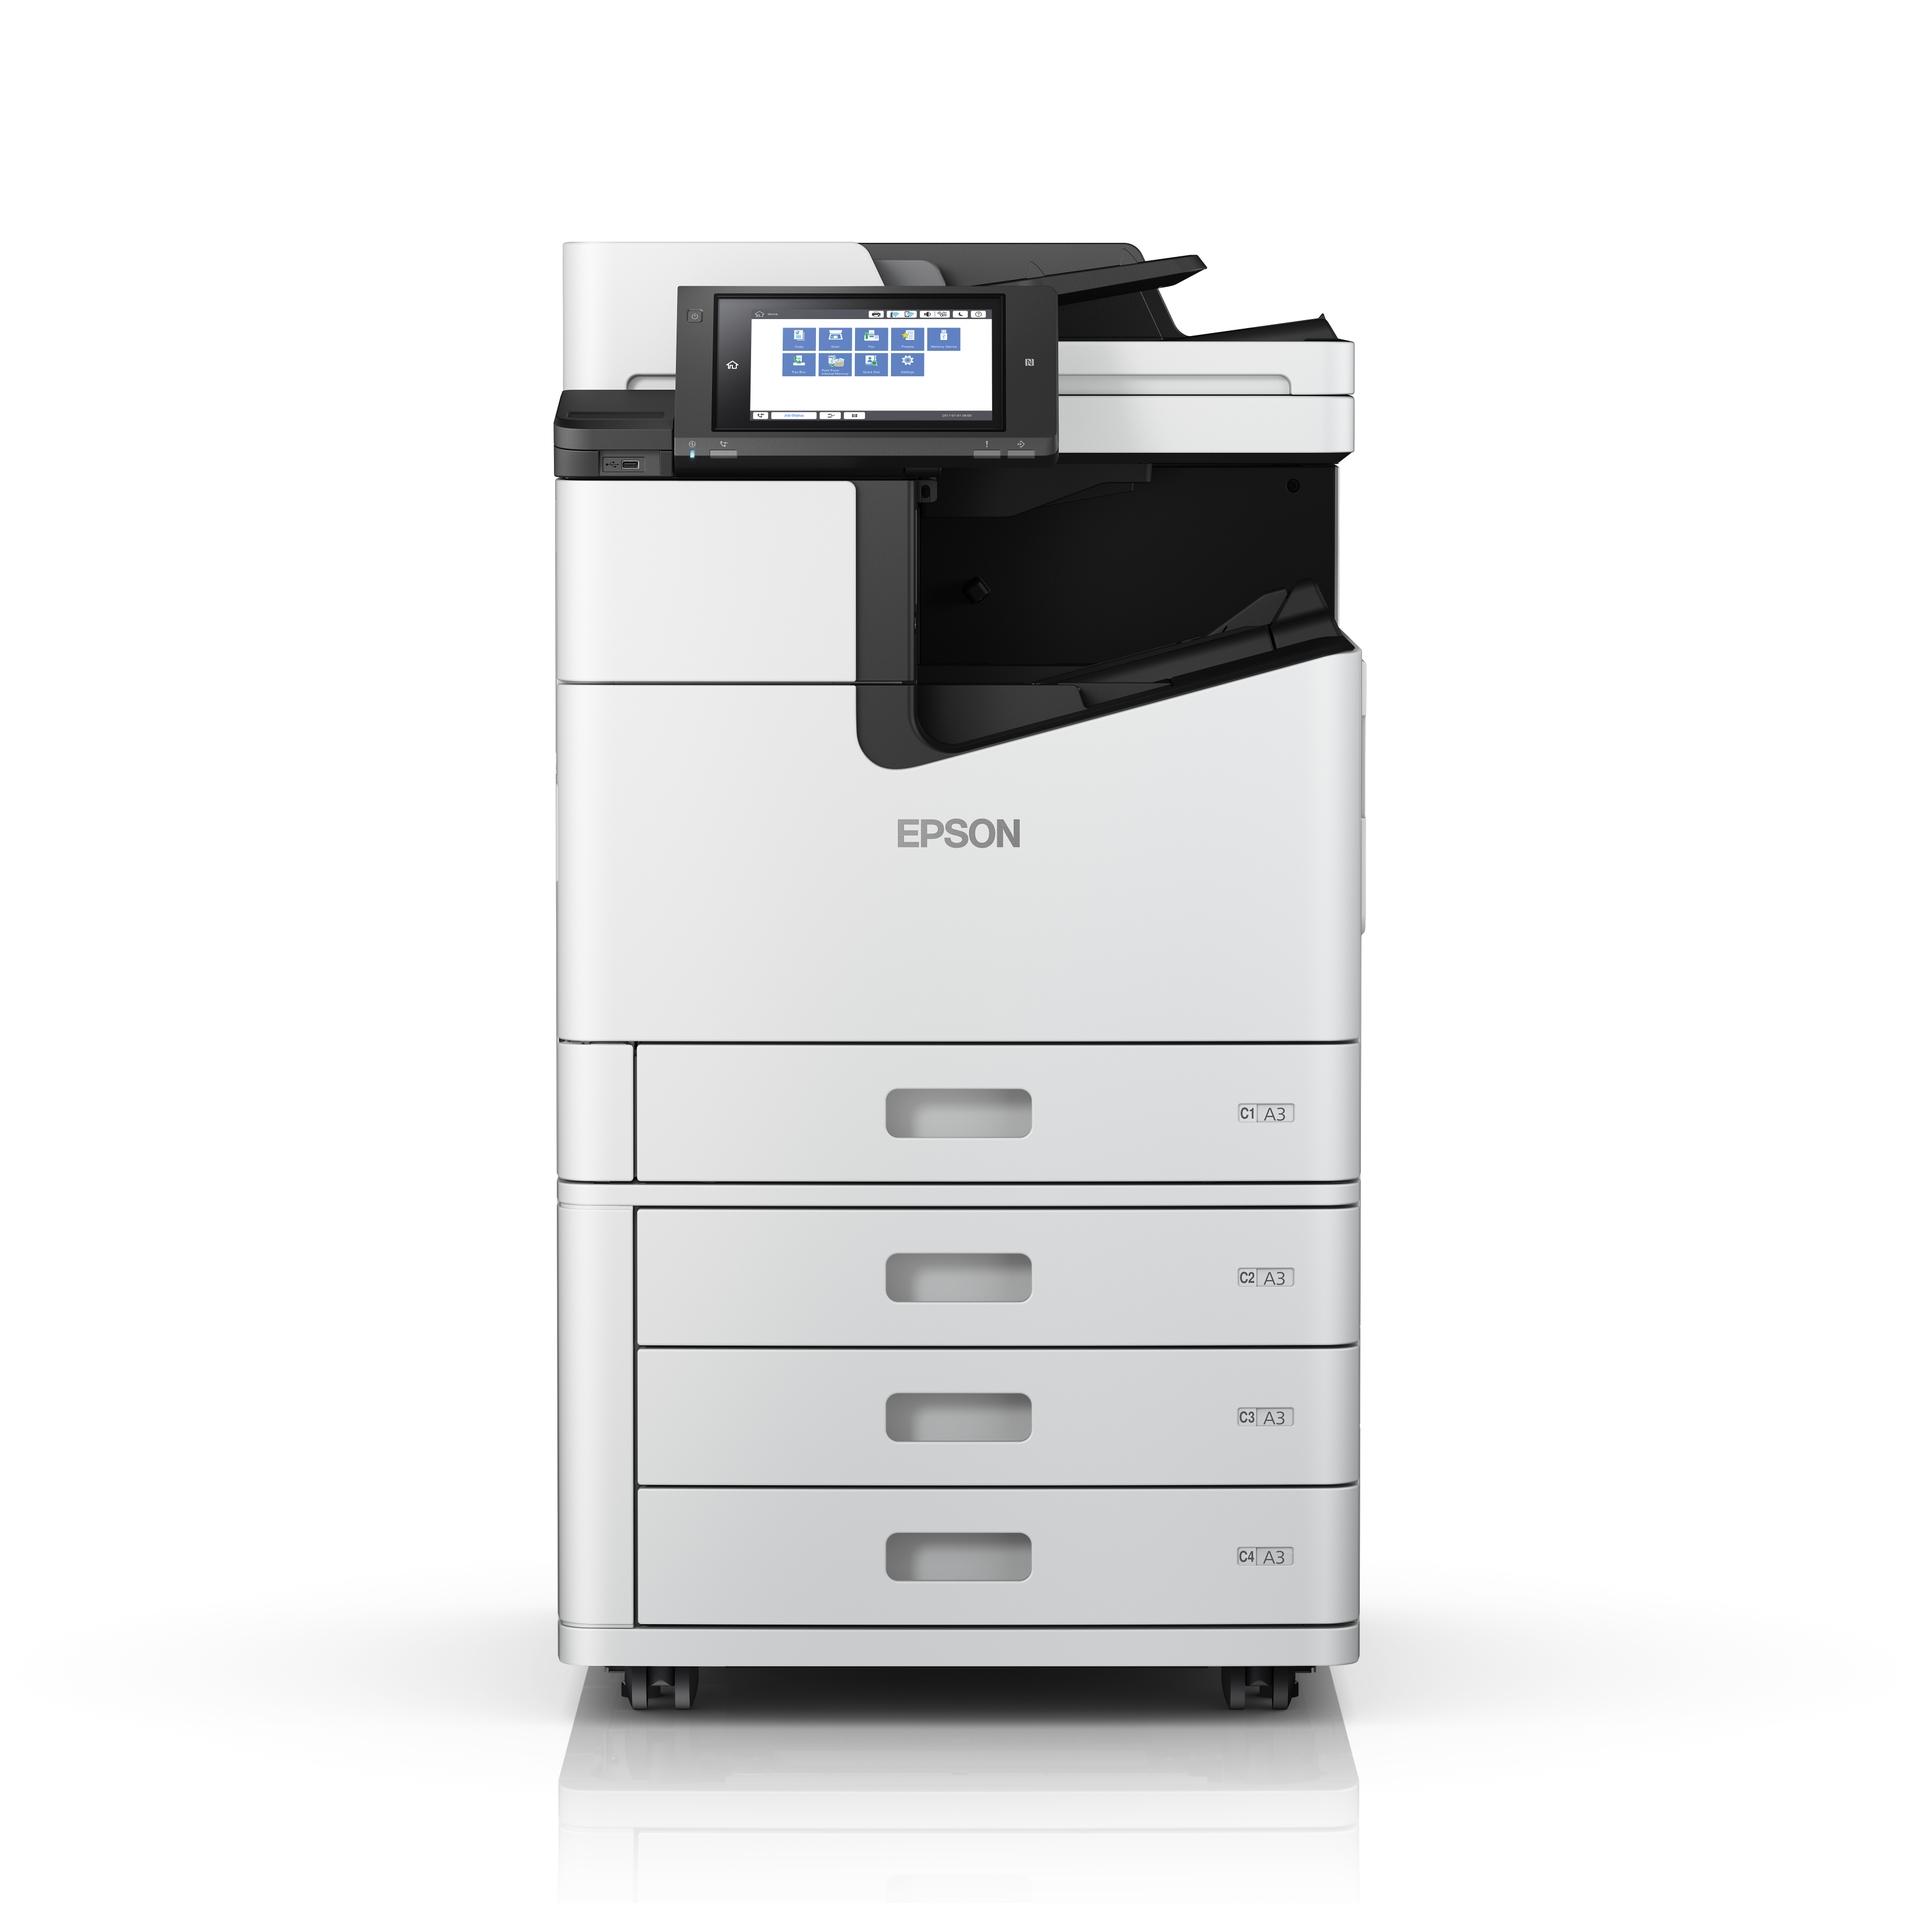 Epson WorkForce Enterprise WF-M20590F